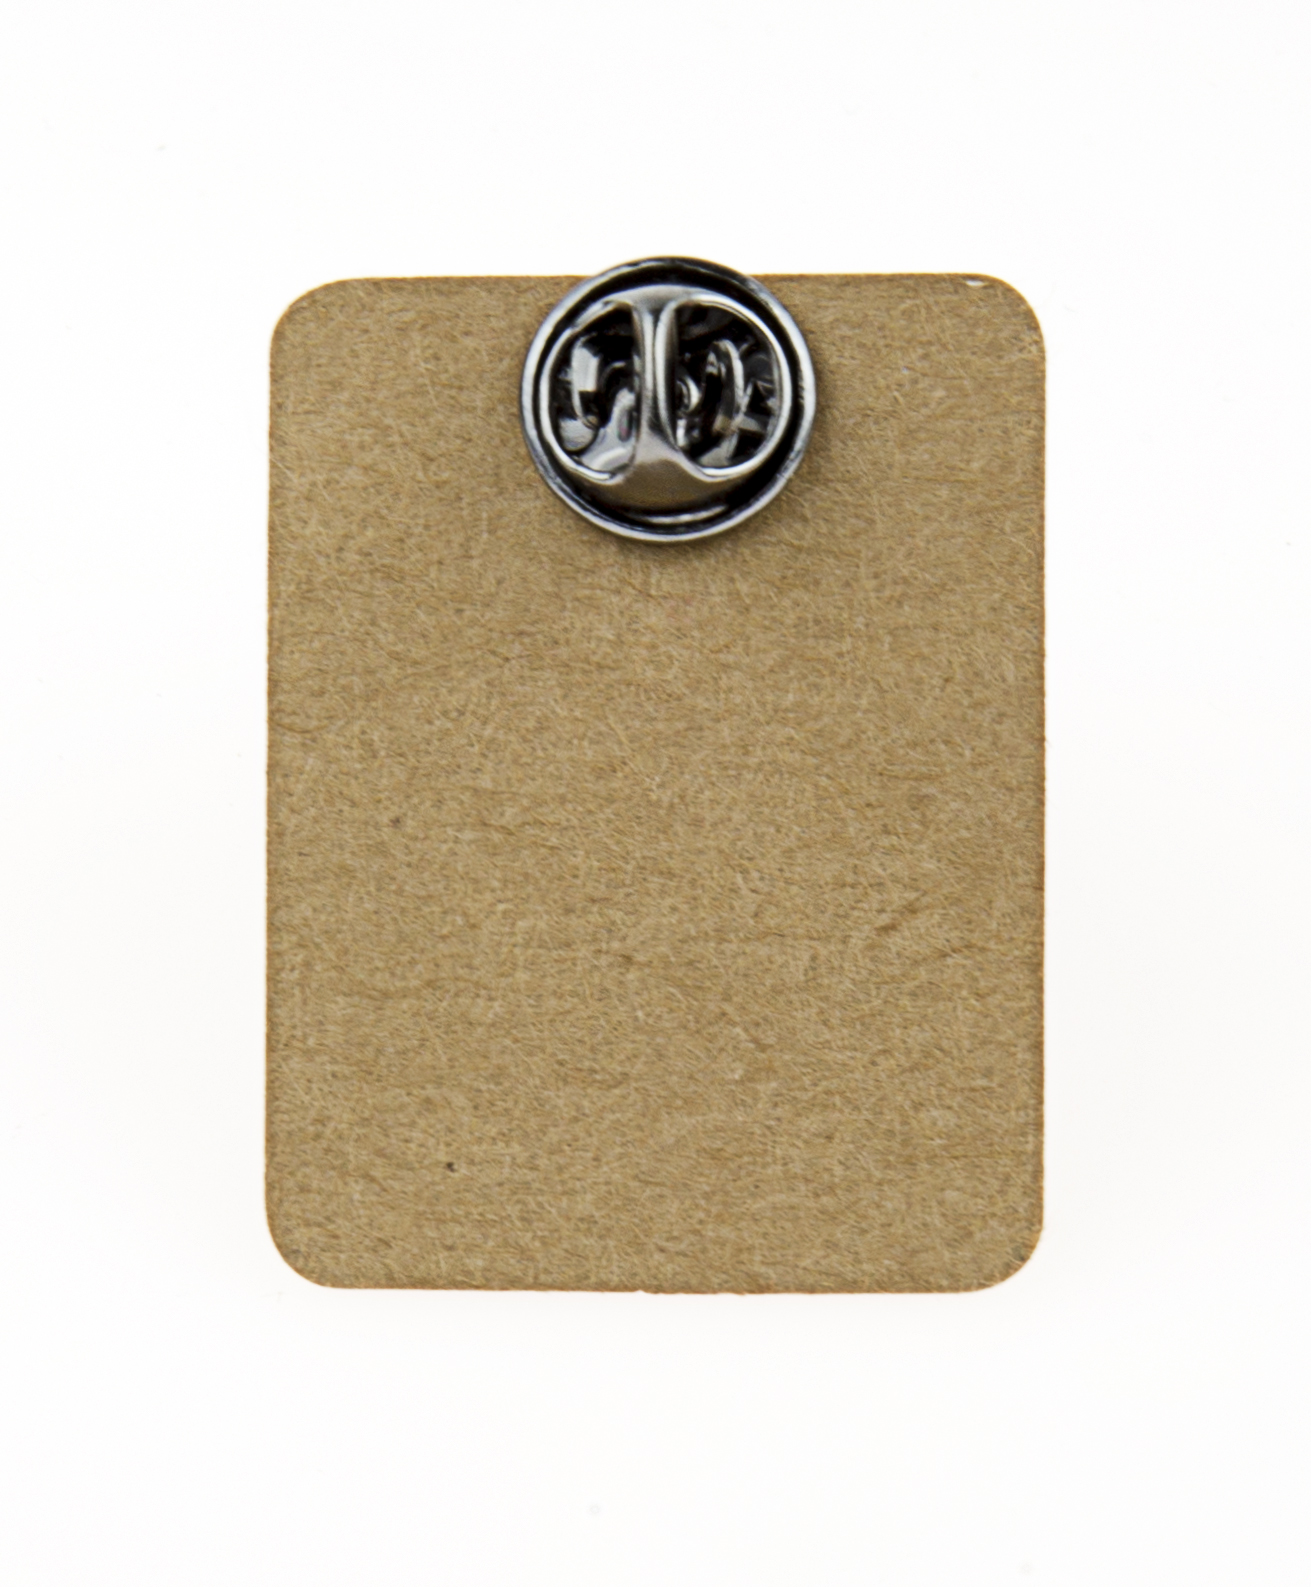 Metal Colourful Rabbit Enamel Pin Badge